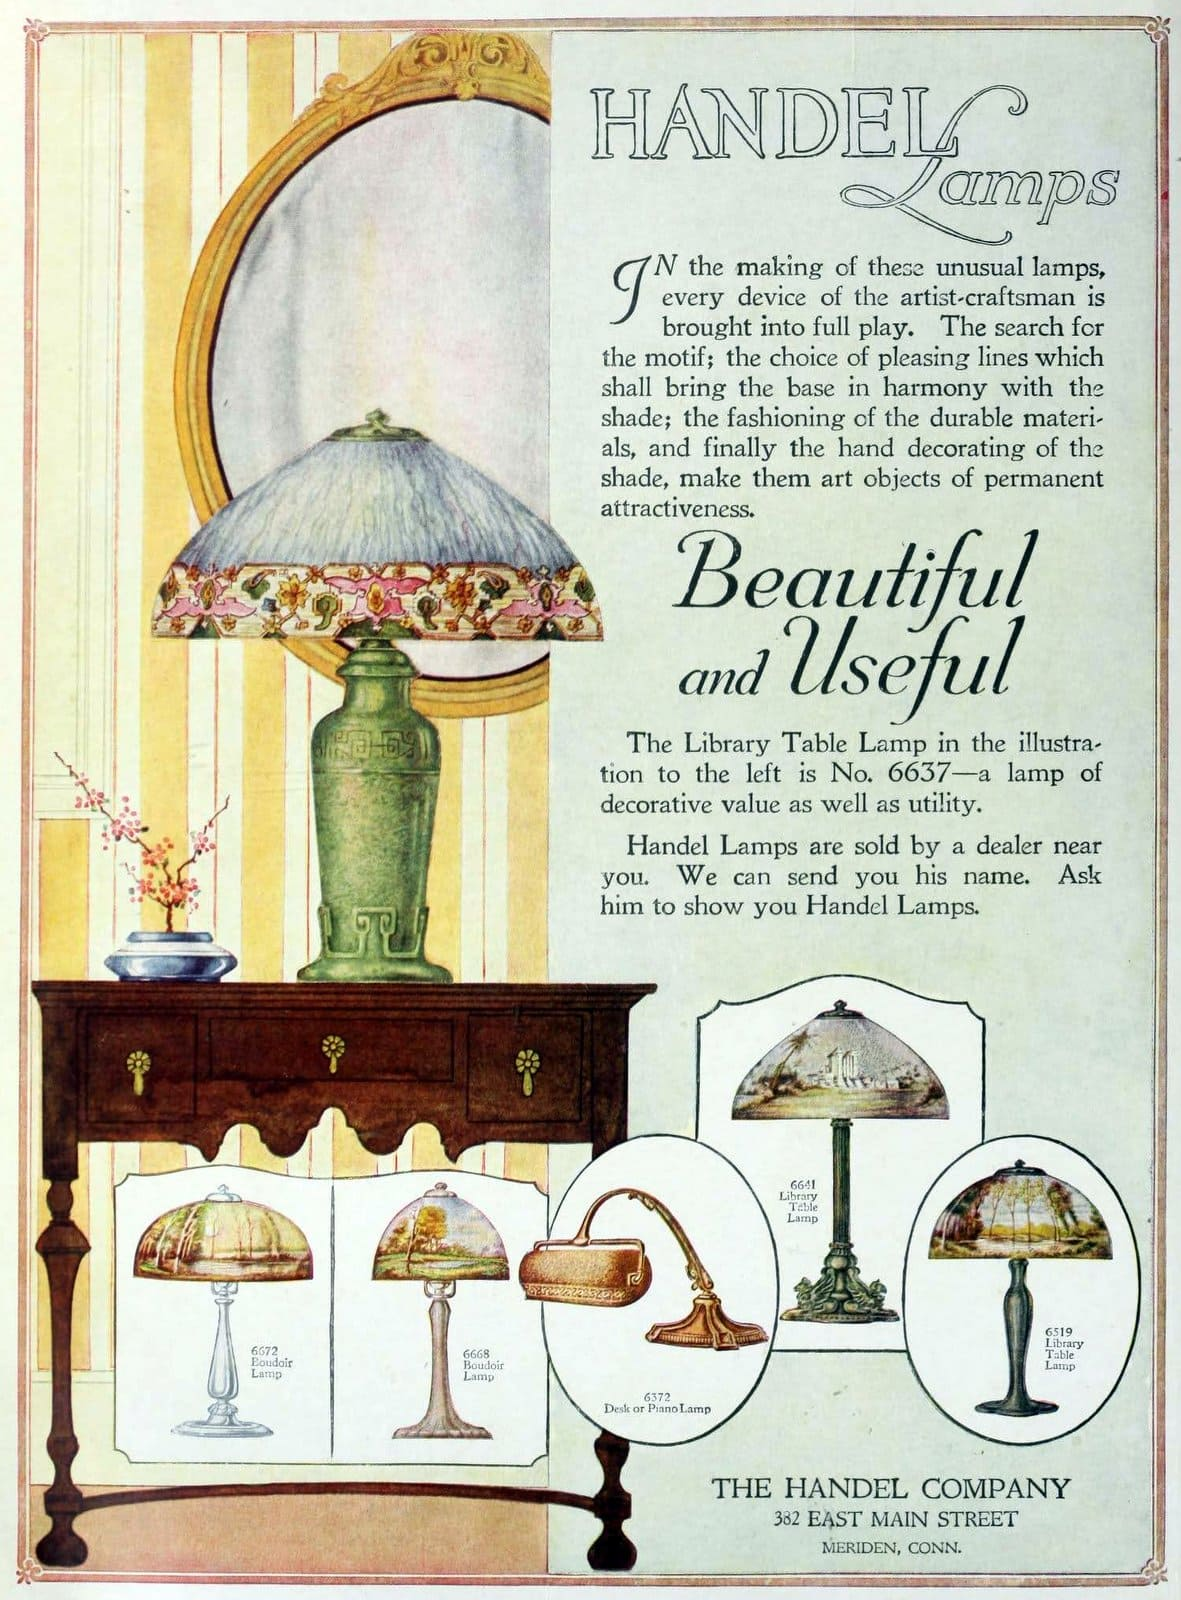 Antique Handel glass shade lamps (1919)